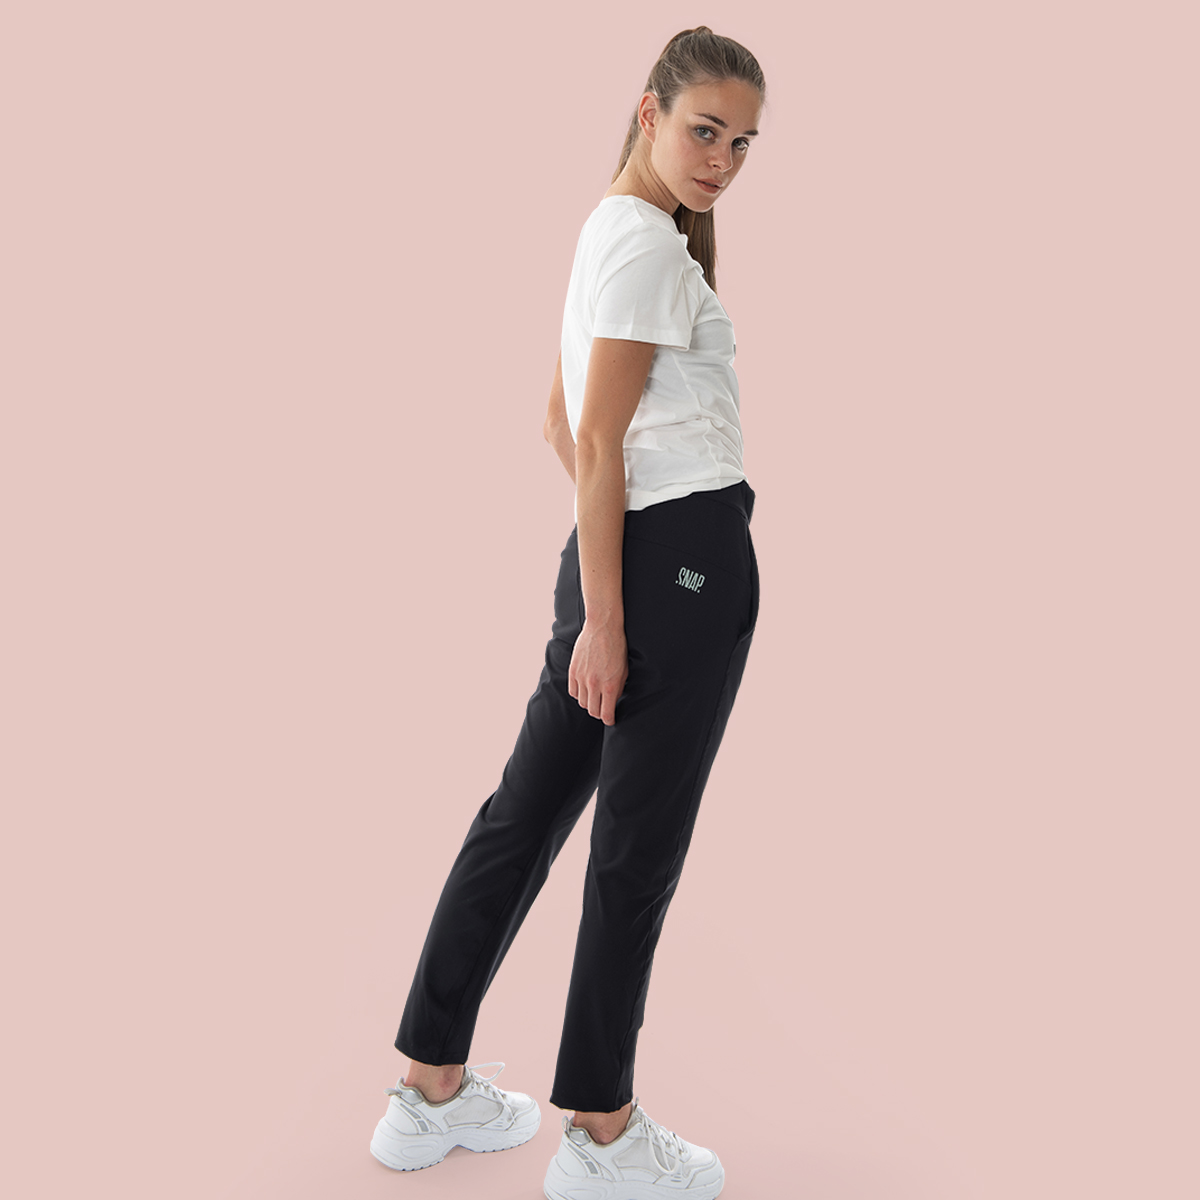 comfortable black pants